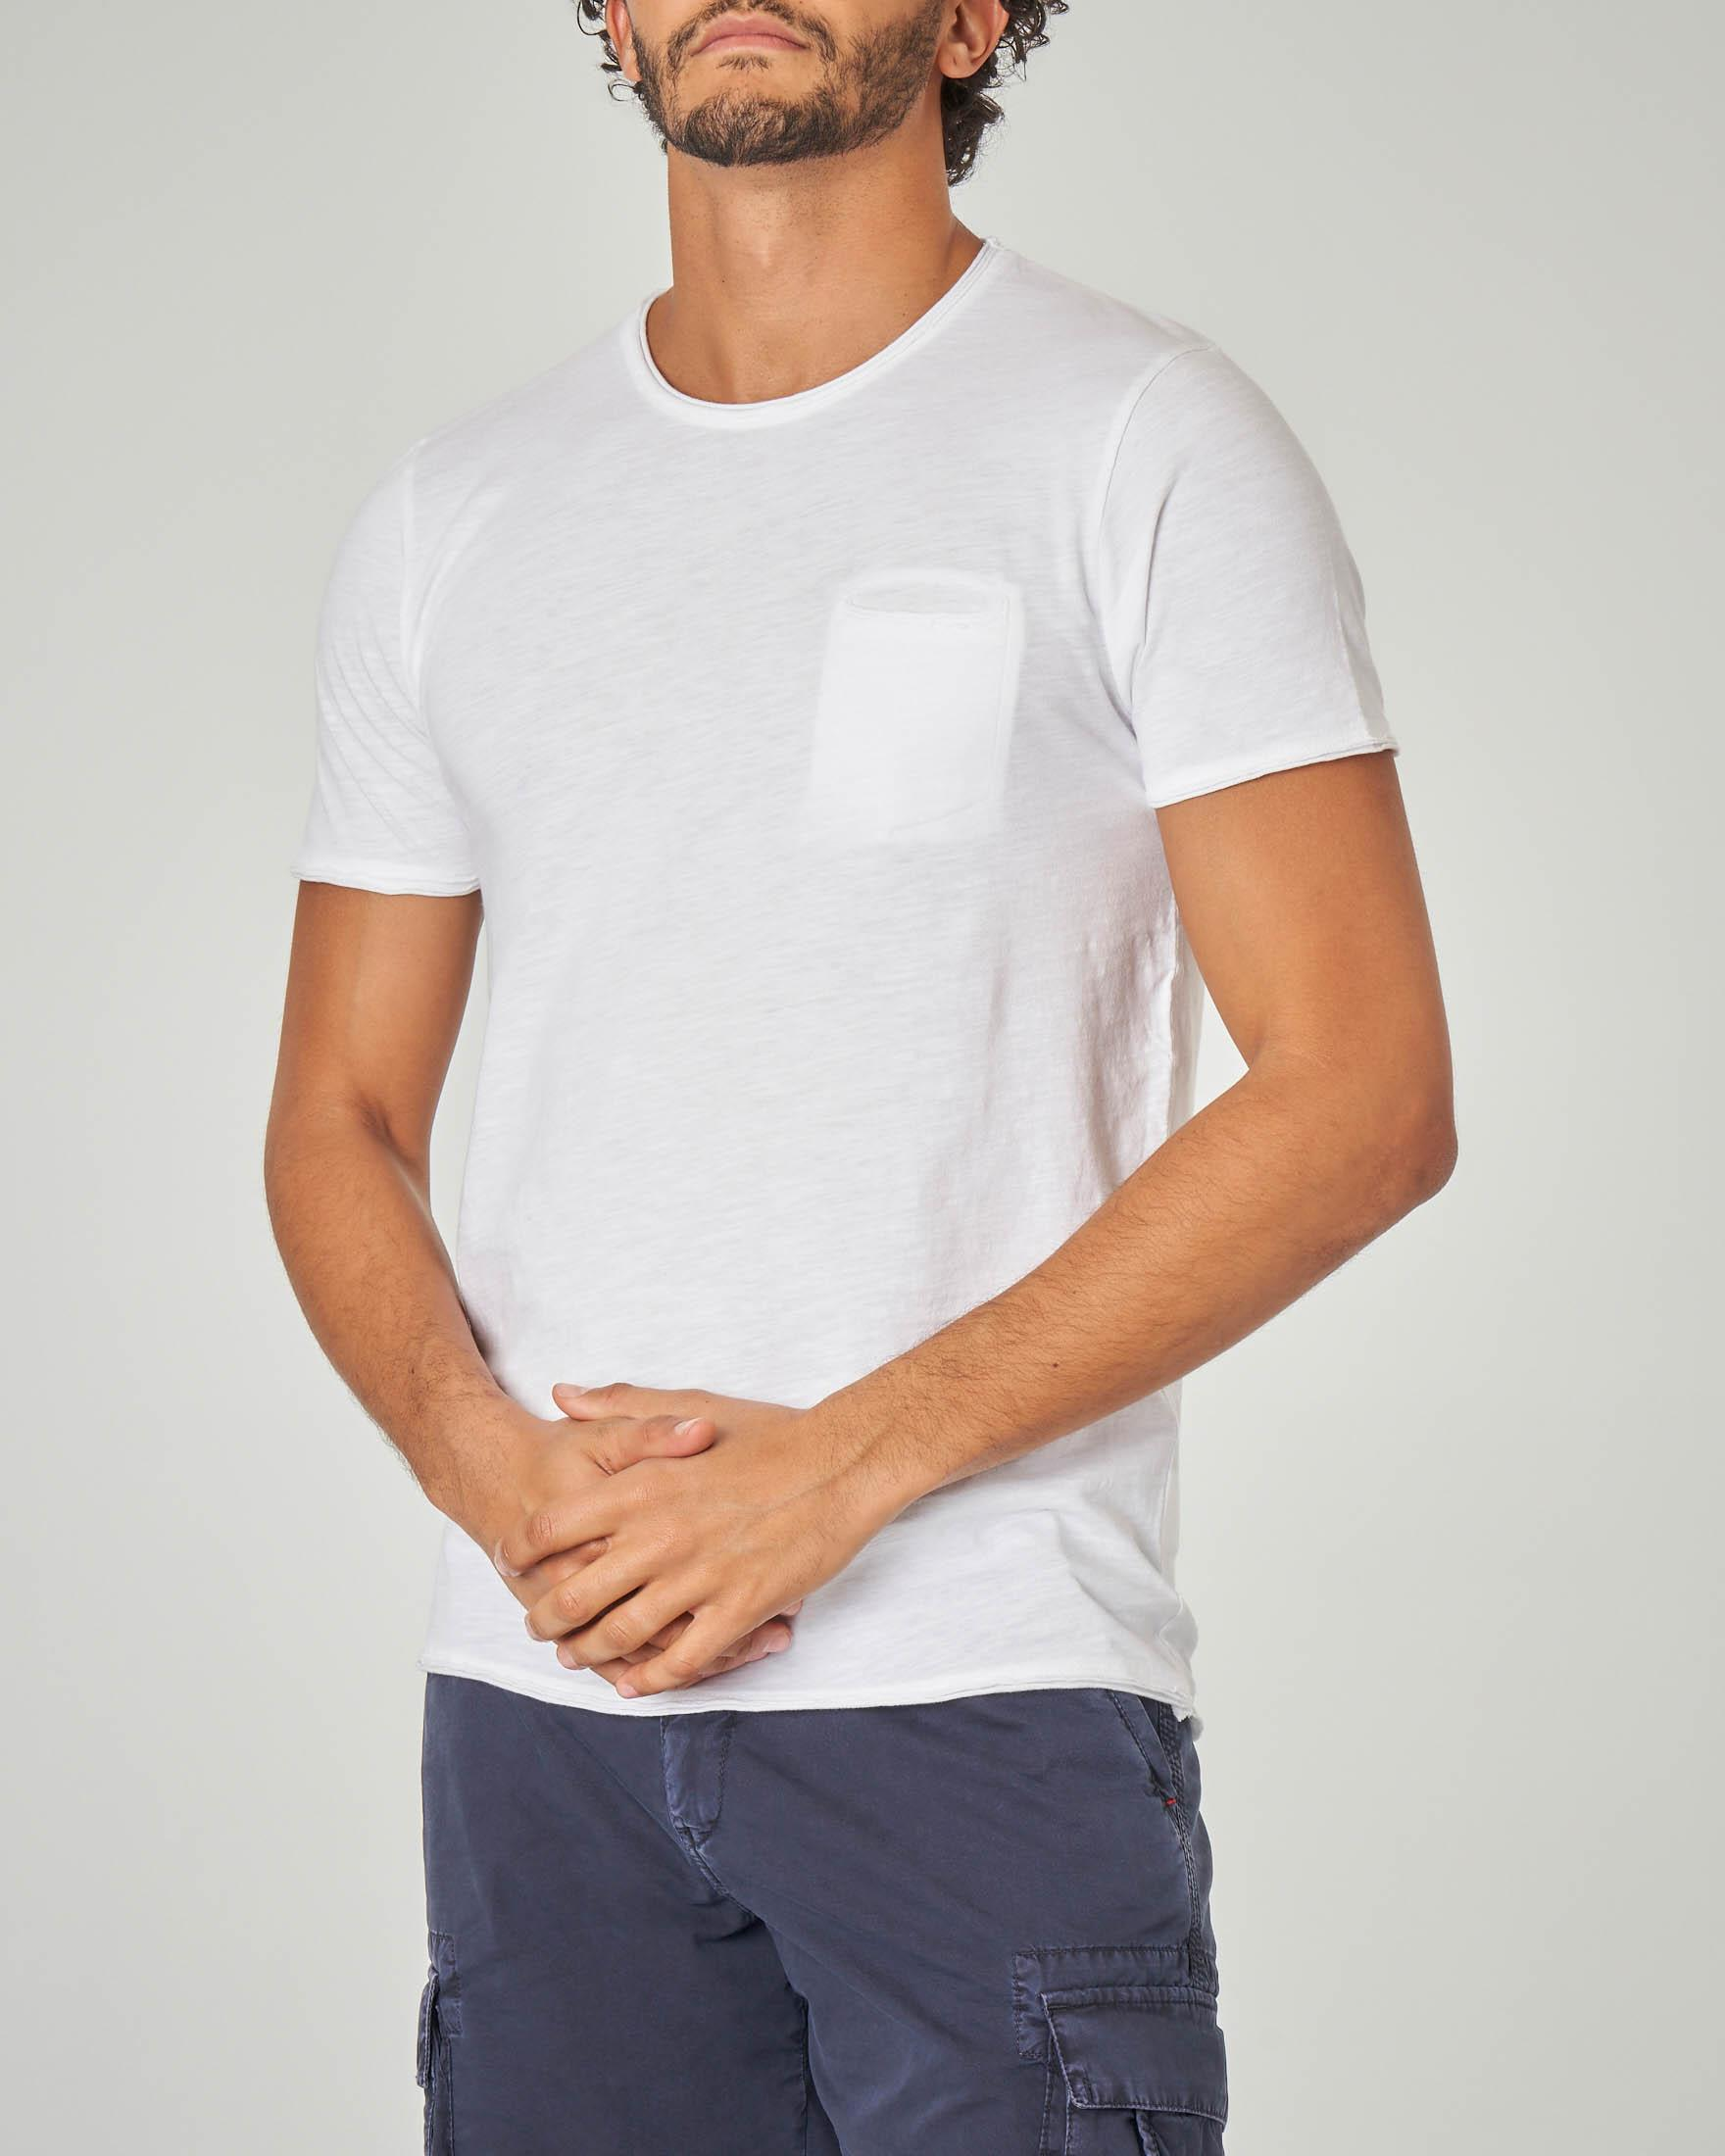 T-shirt bianca con taschino a filo